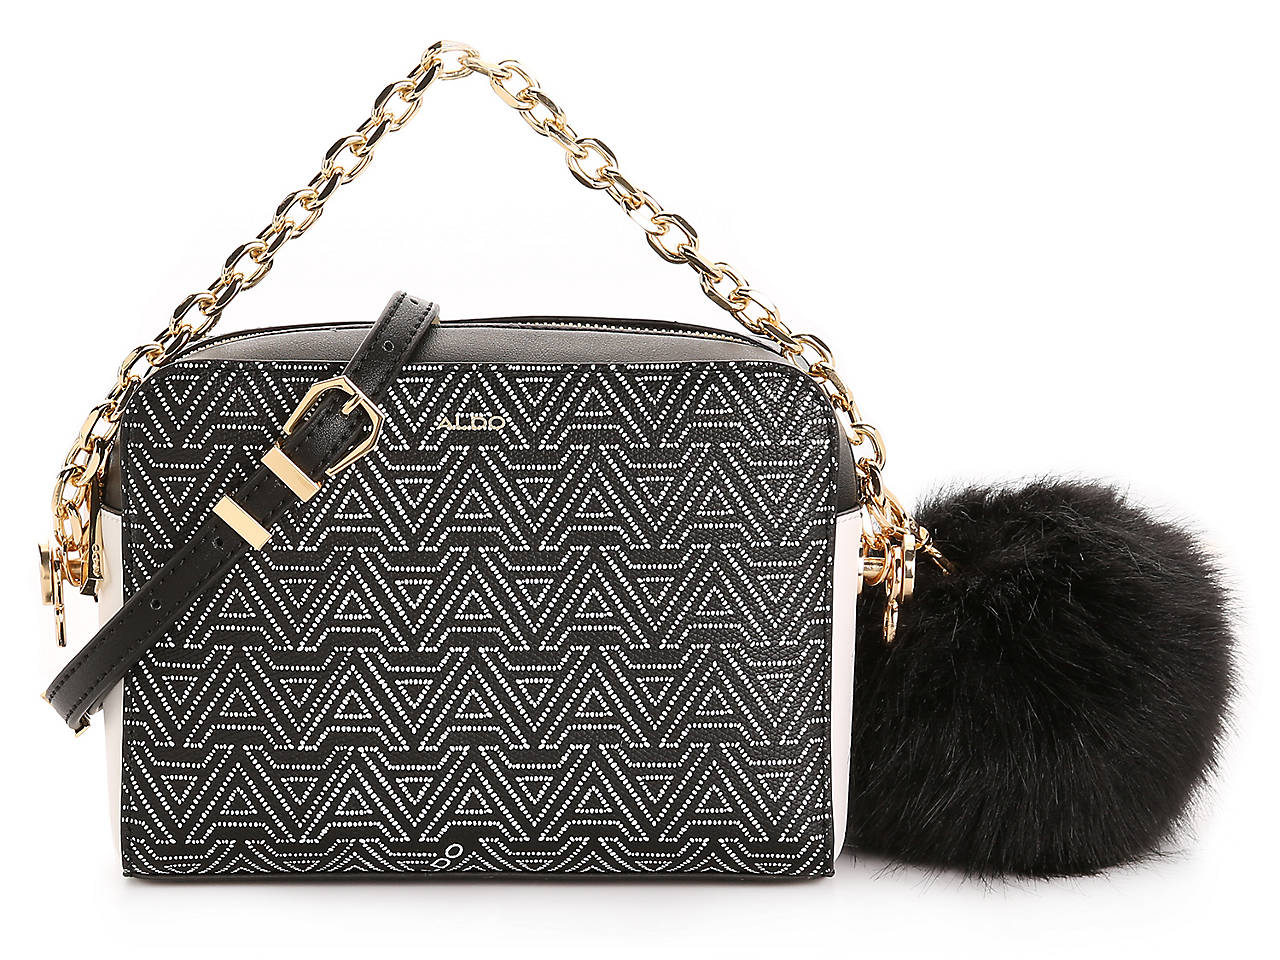 a6d6d00c51a Aldo Daromani Crossbody Bag Women s Handbags   Accessories